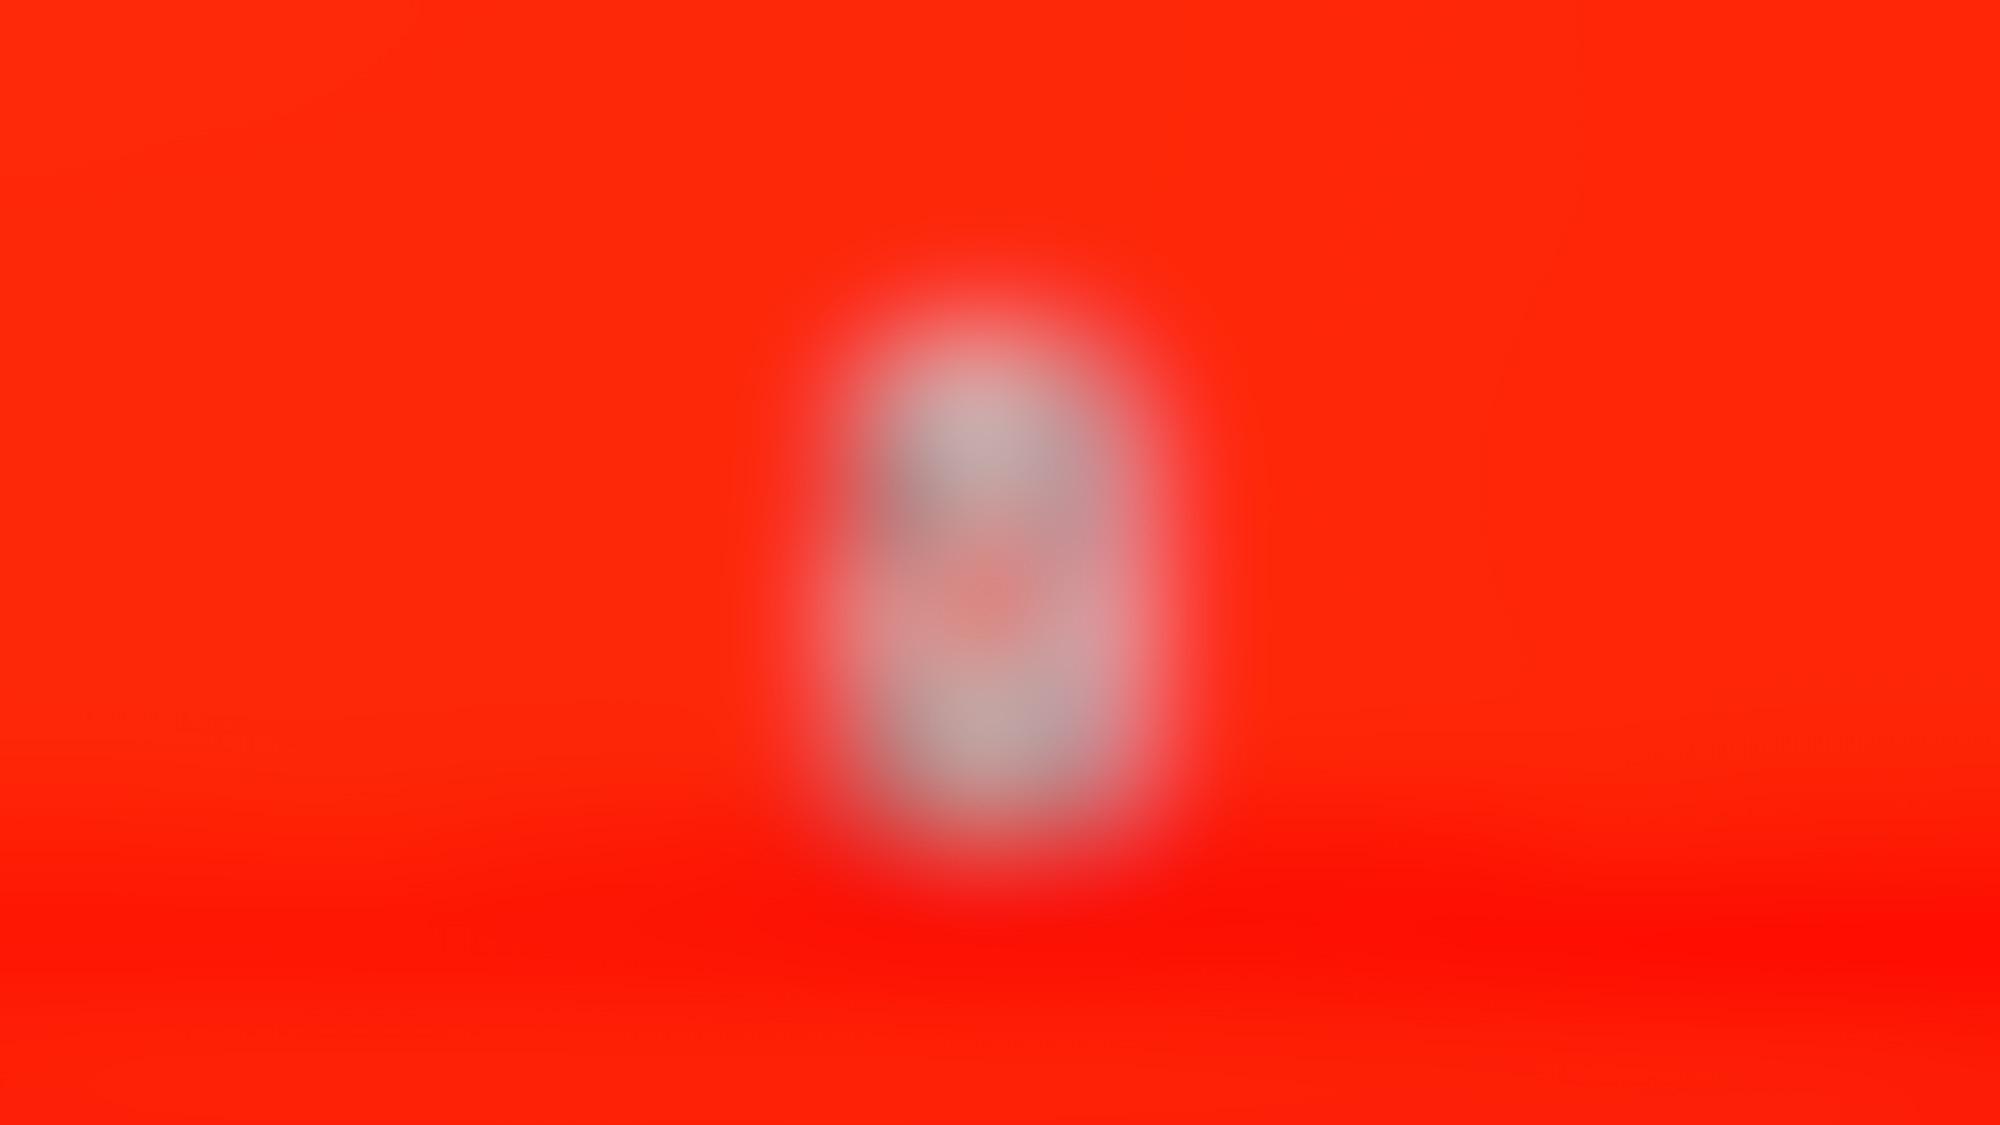 KOTO emoji 00005 autocompressfitresizeixlibphp 1 1 0max h2000max w3 D2000q80s6c9a9e9f921bc148417dbe80c081ec9c